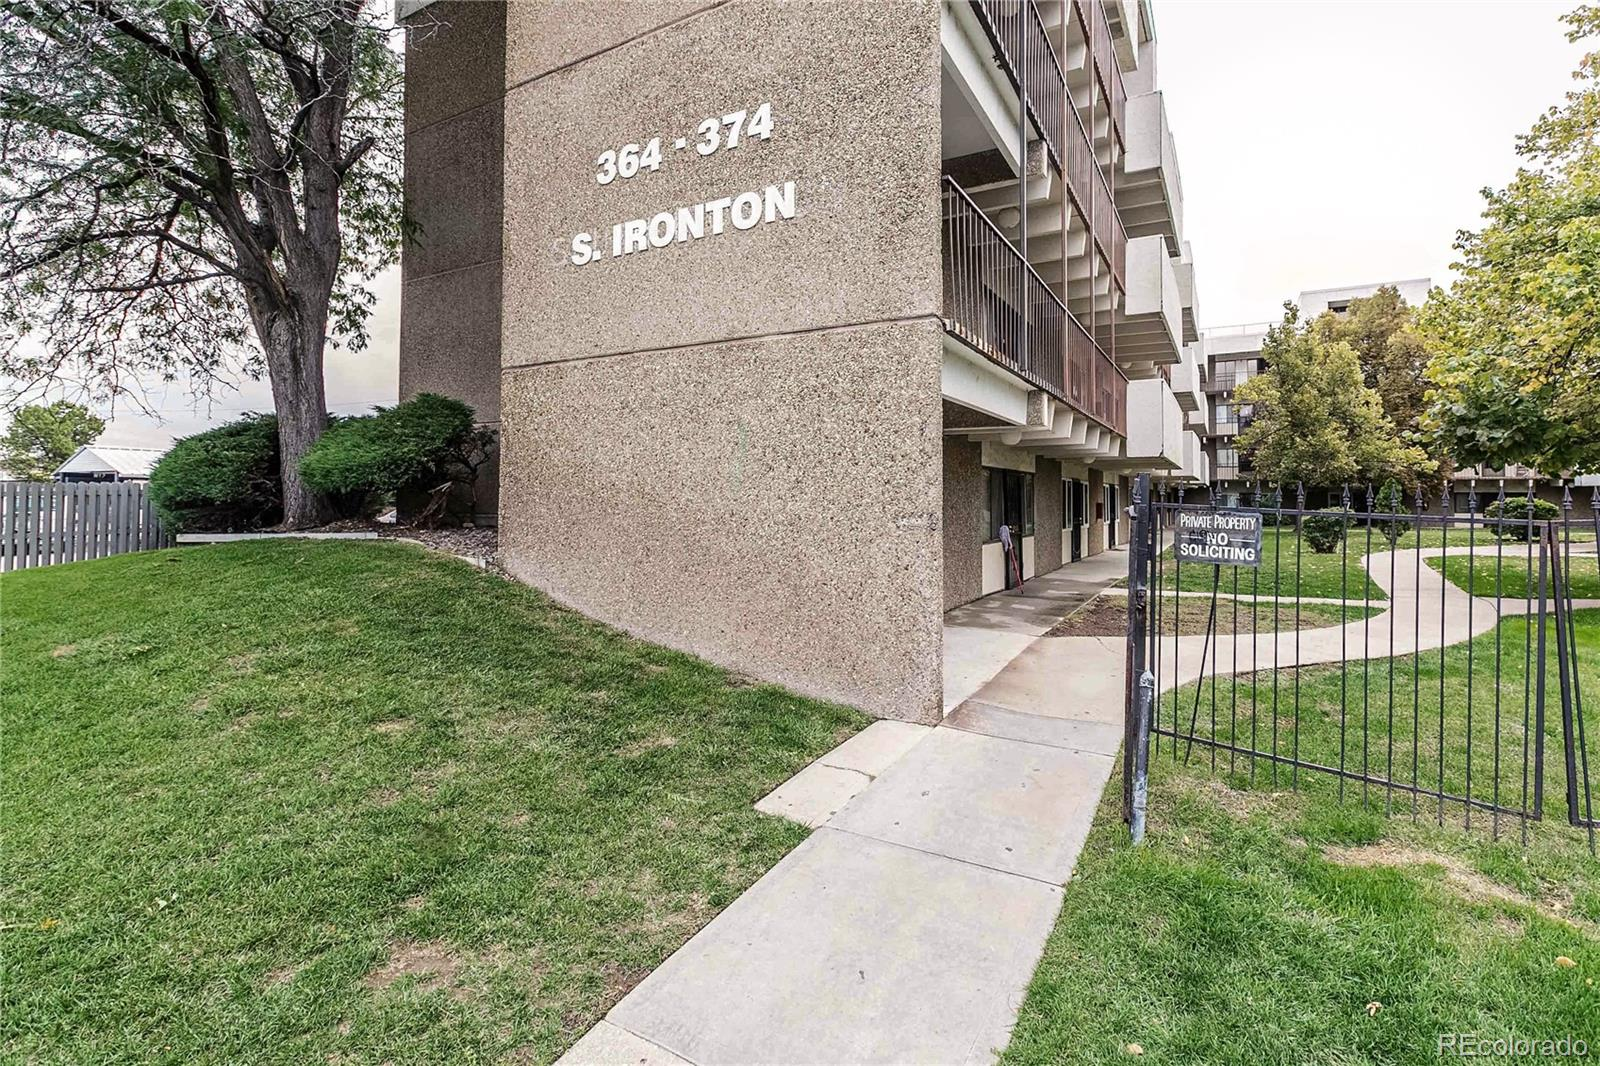 MLS# 2219127 - 3 - 364 S Ironton Street #328, Aurora, CO 80012